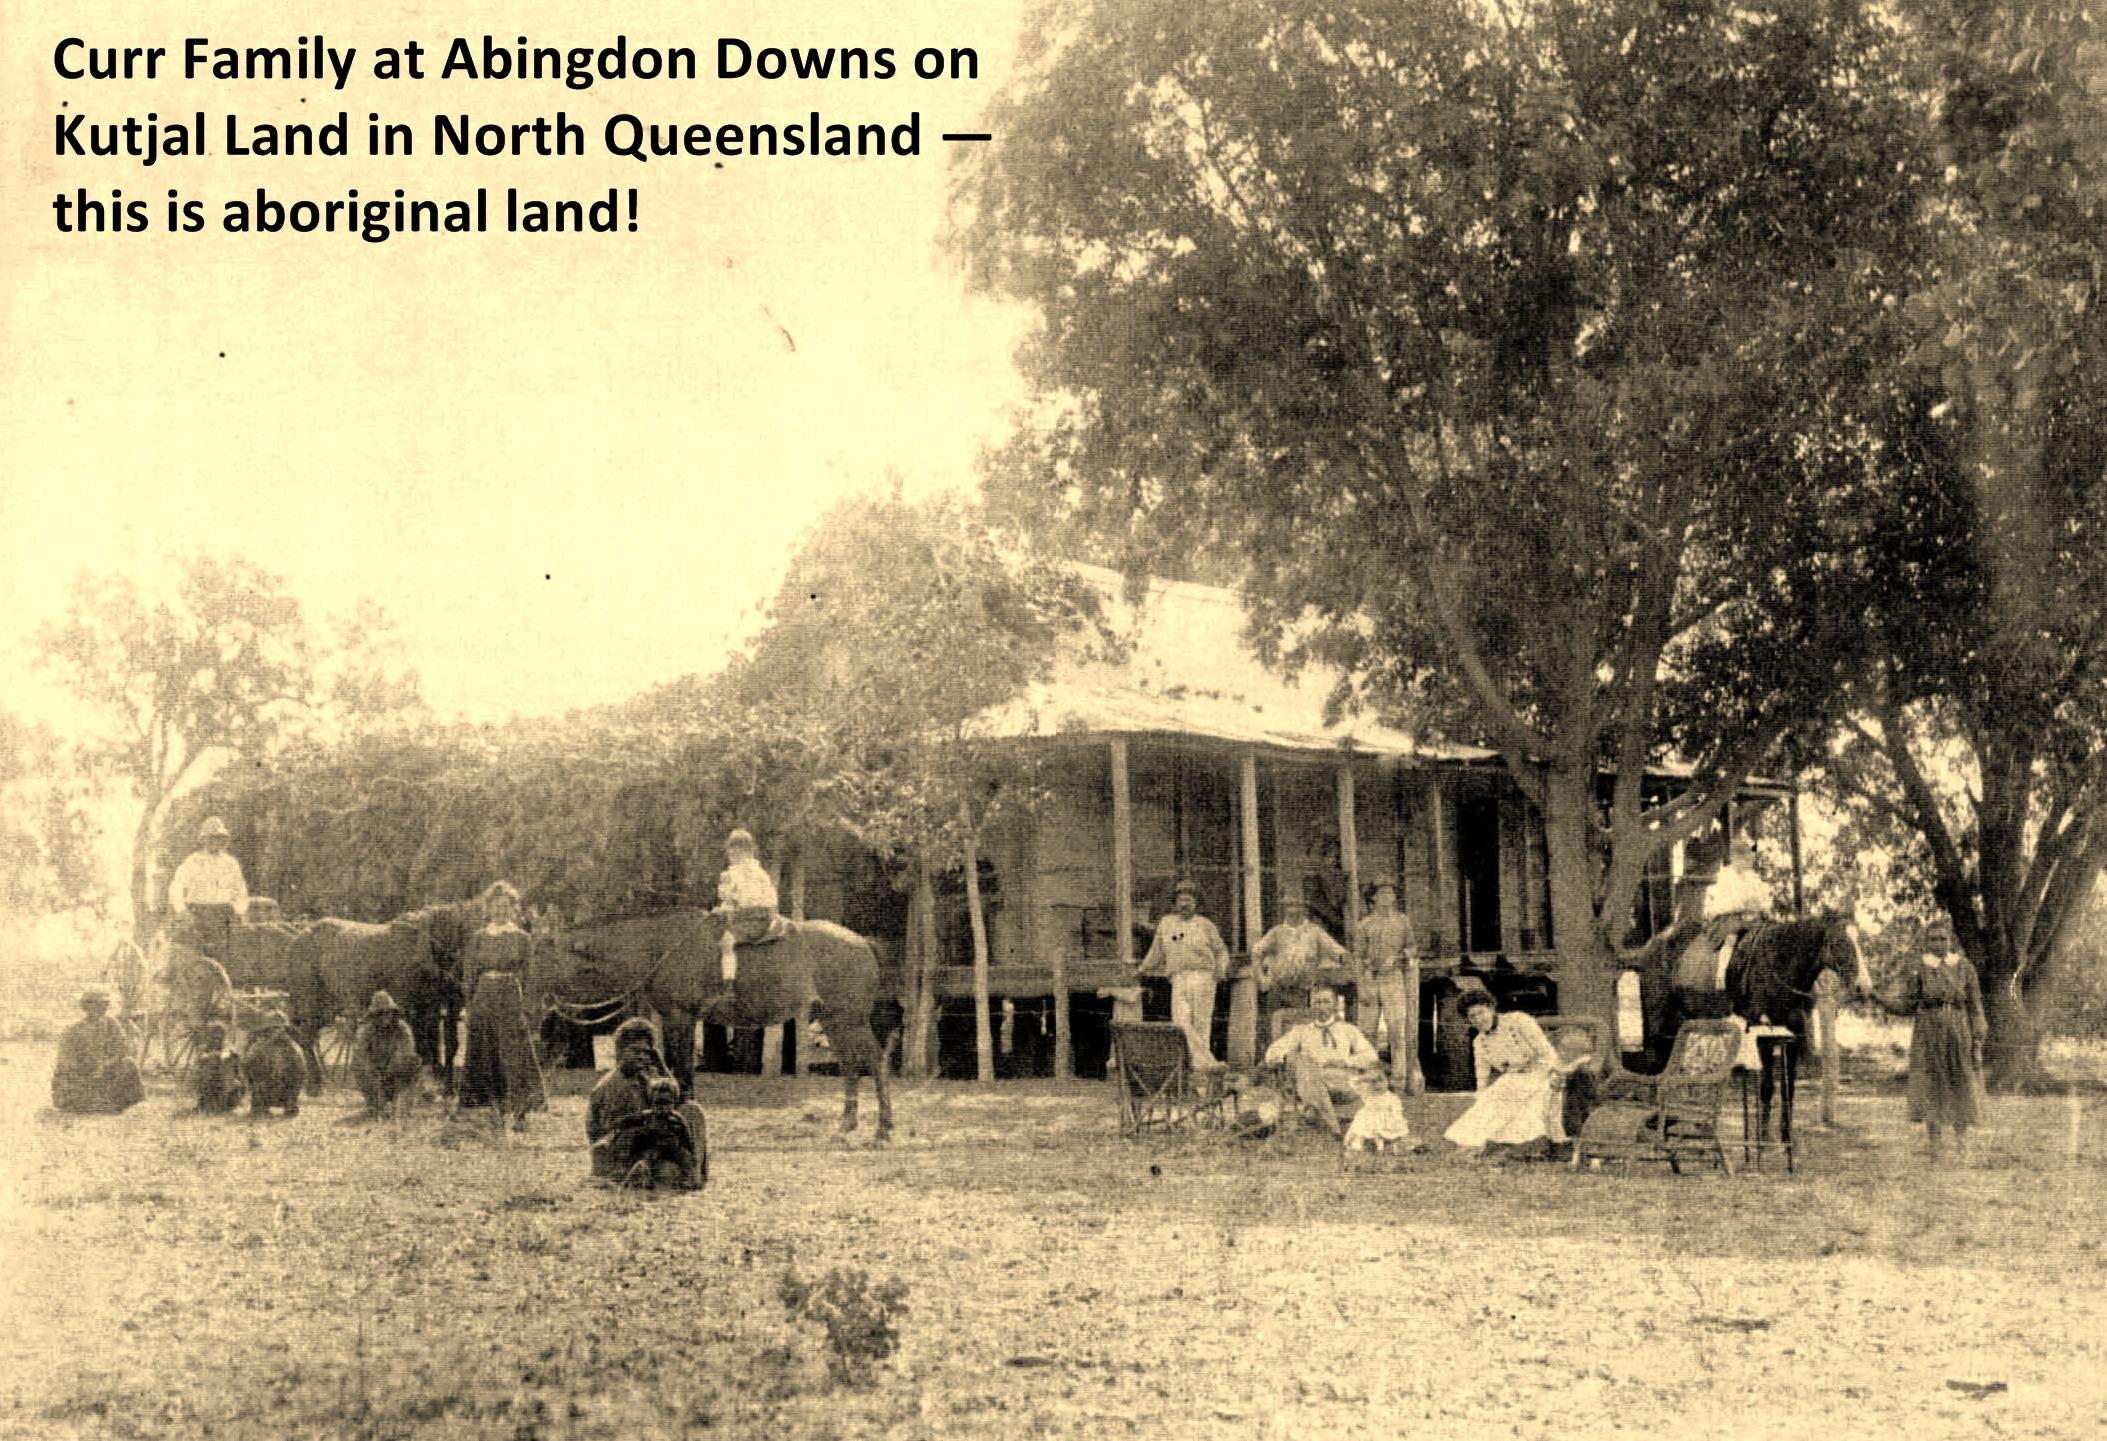 Abingdon Downs on Kutjal land in North Queensland